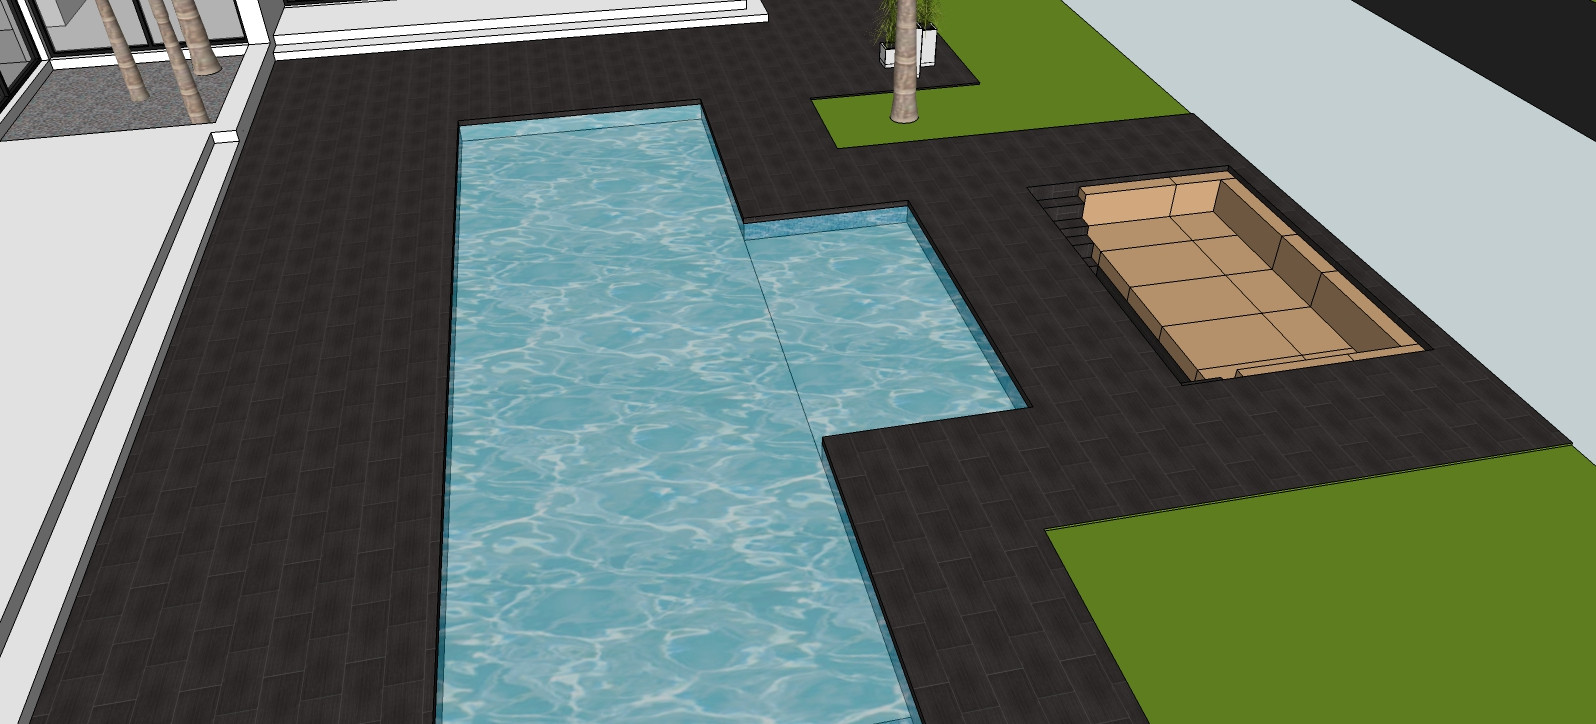 catral A pool idea.jpg